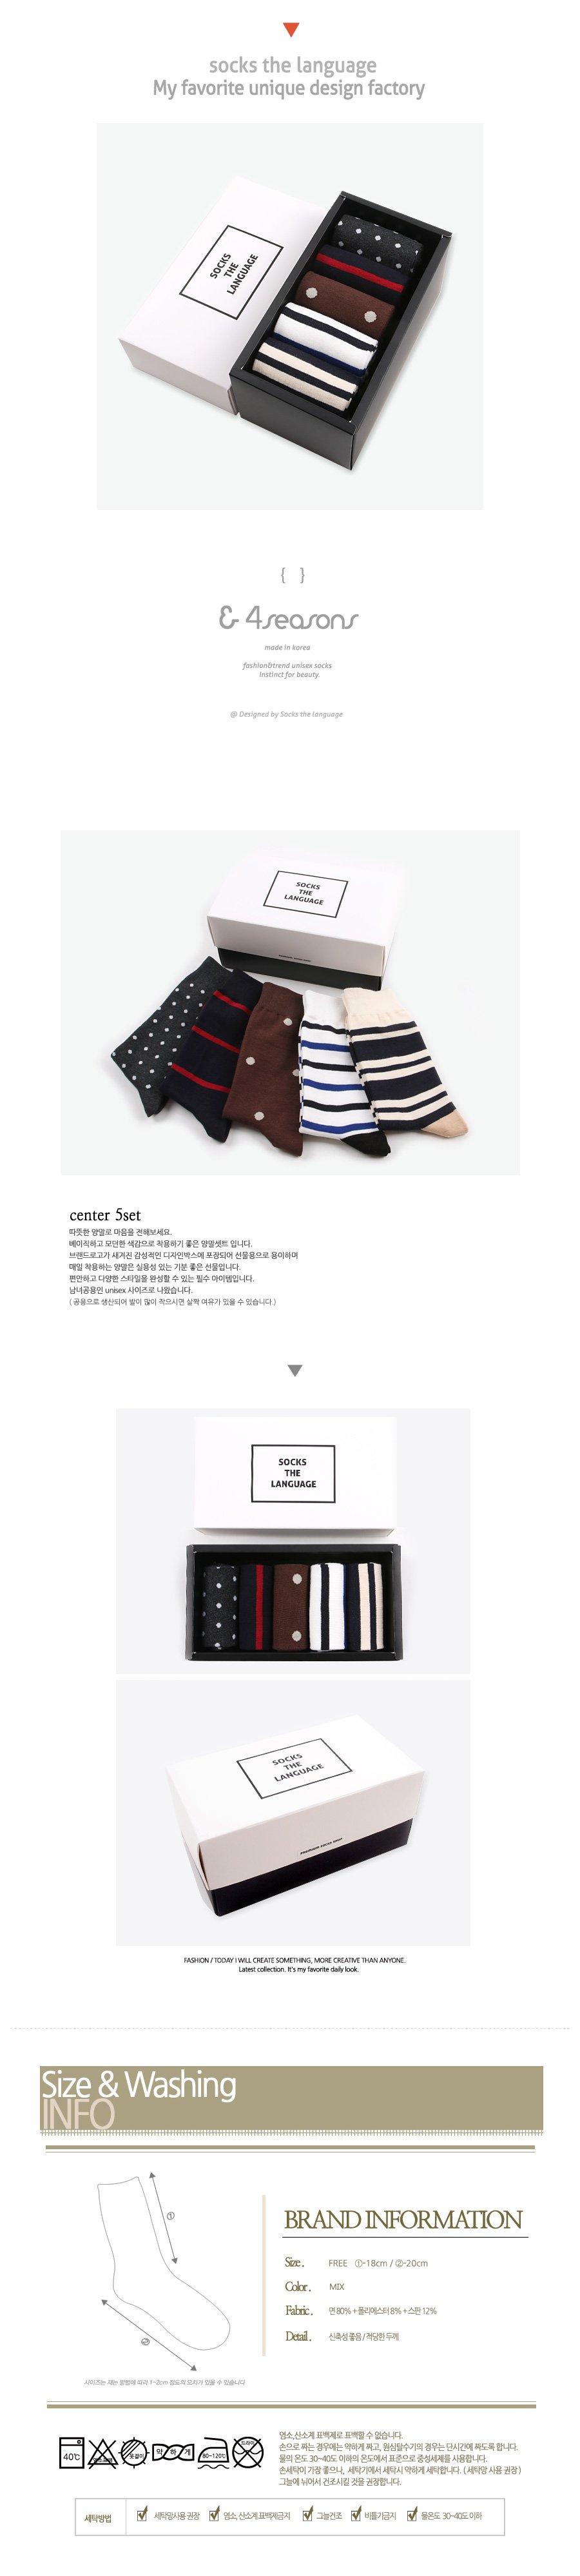 center_5set 양말세트 - 삭스더랭귀지, 31,000원, 남성양말, 패션양말